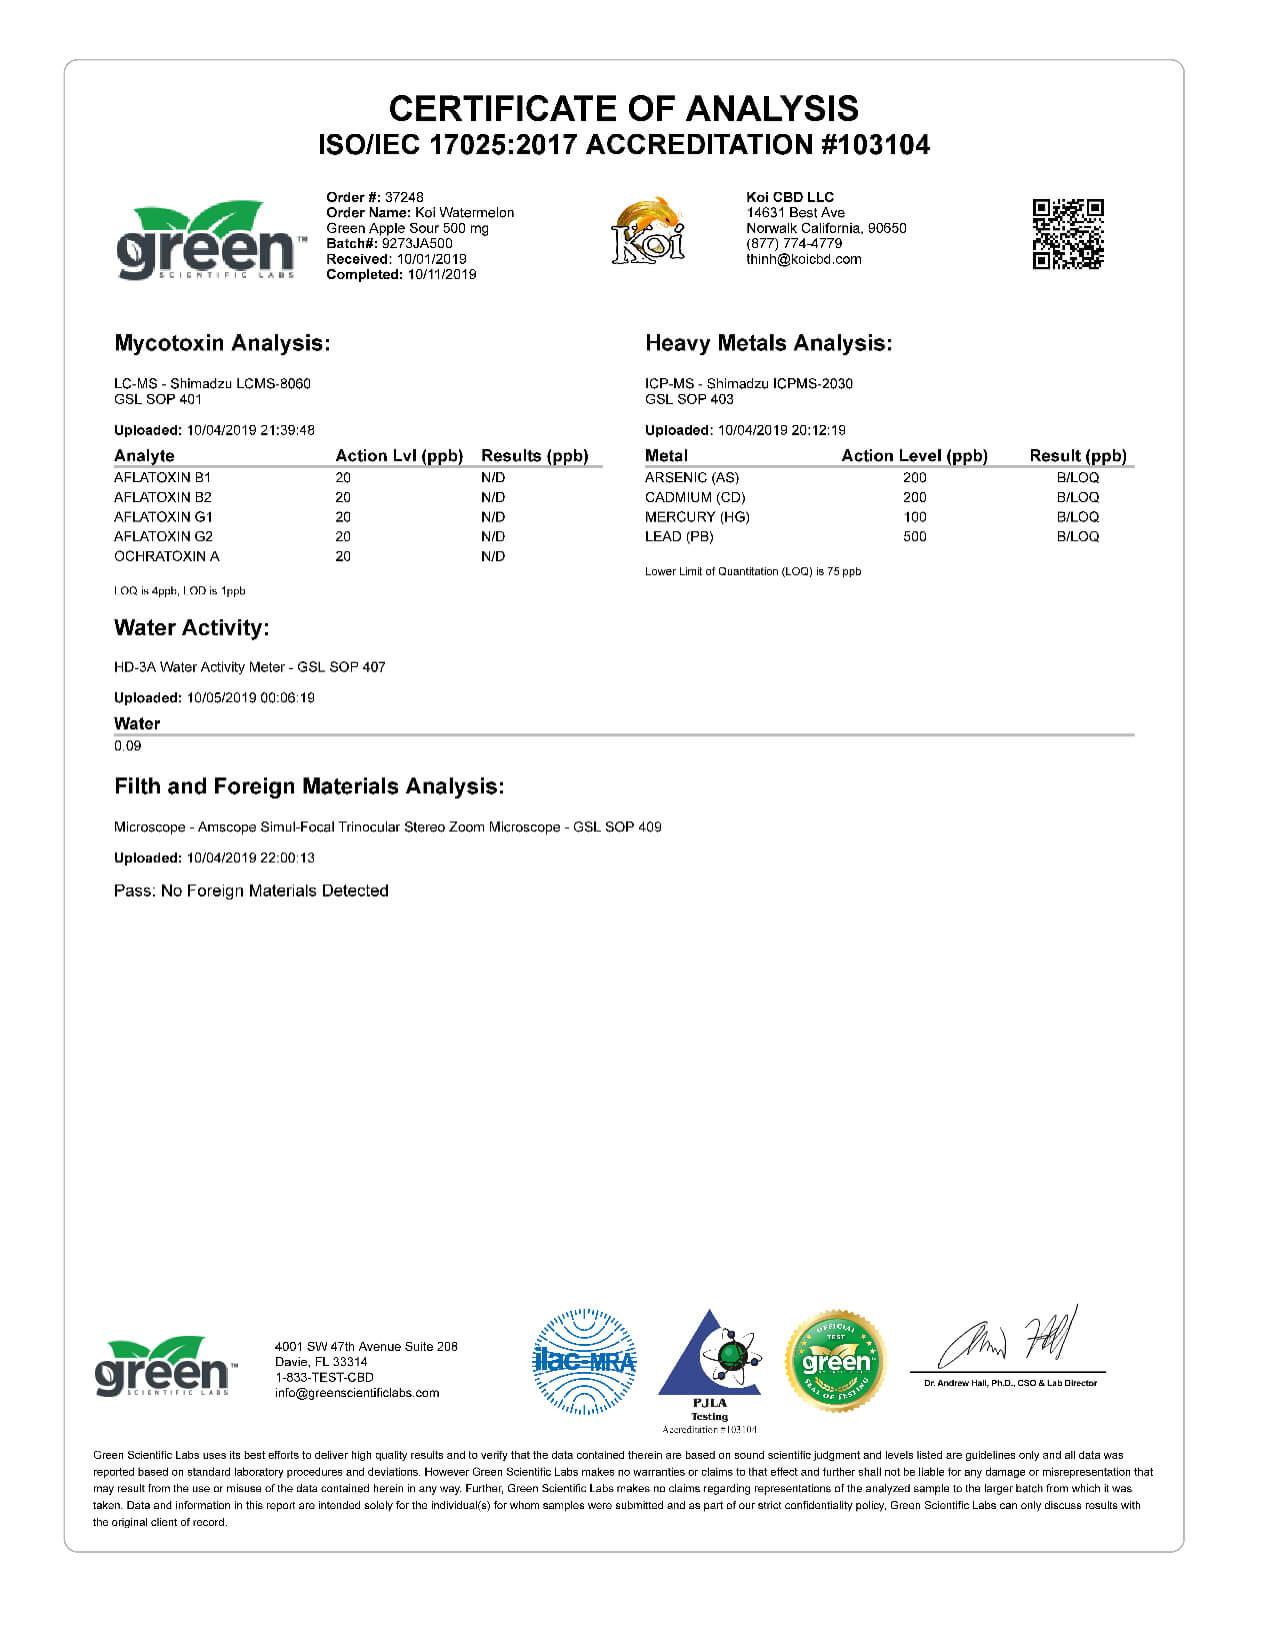 Koi CBD Watermelon Green Apple Sour Vape Oil 500mg page6